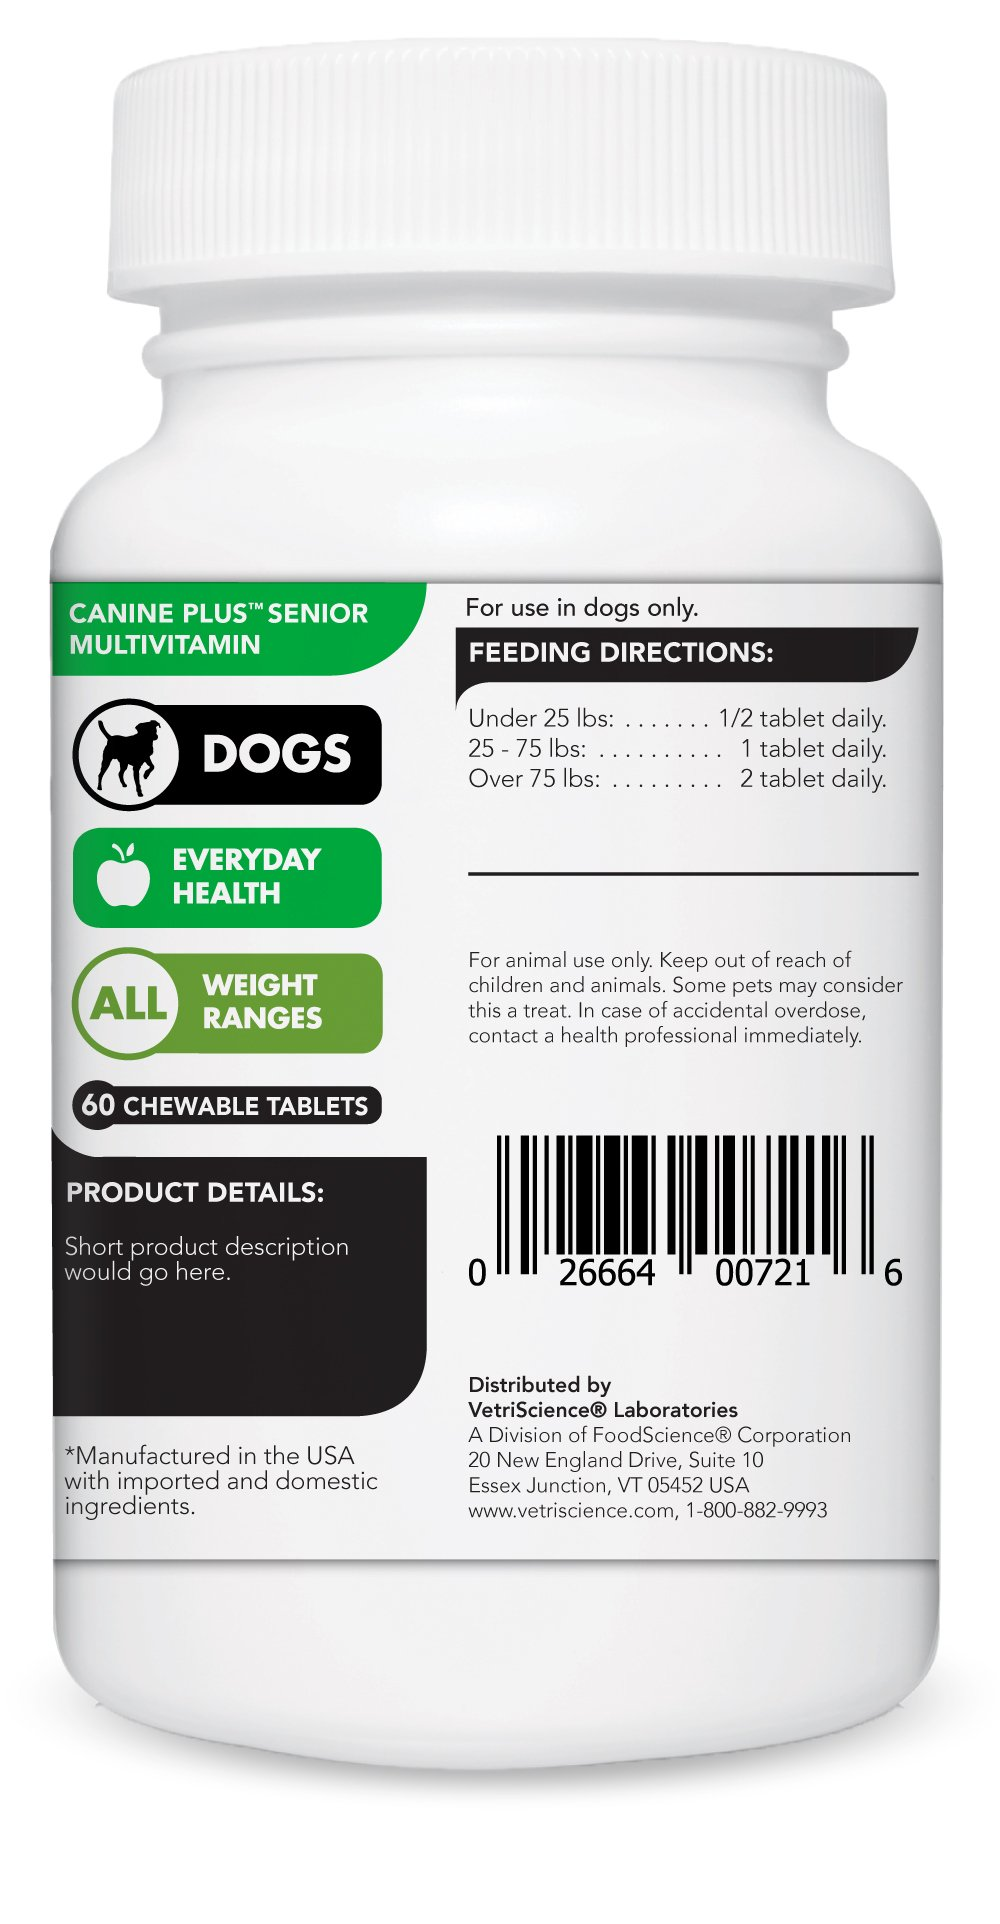 vetri science canine plus multi vitamin health for dog